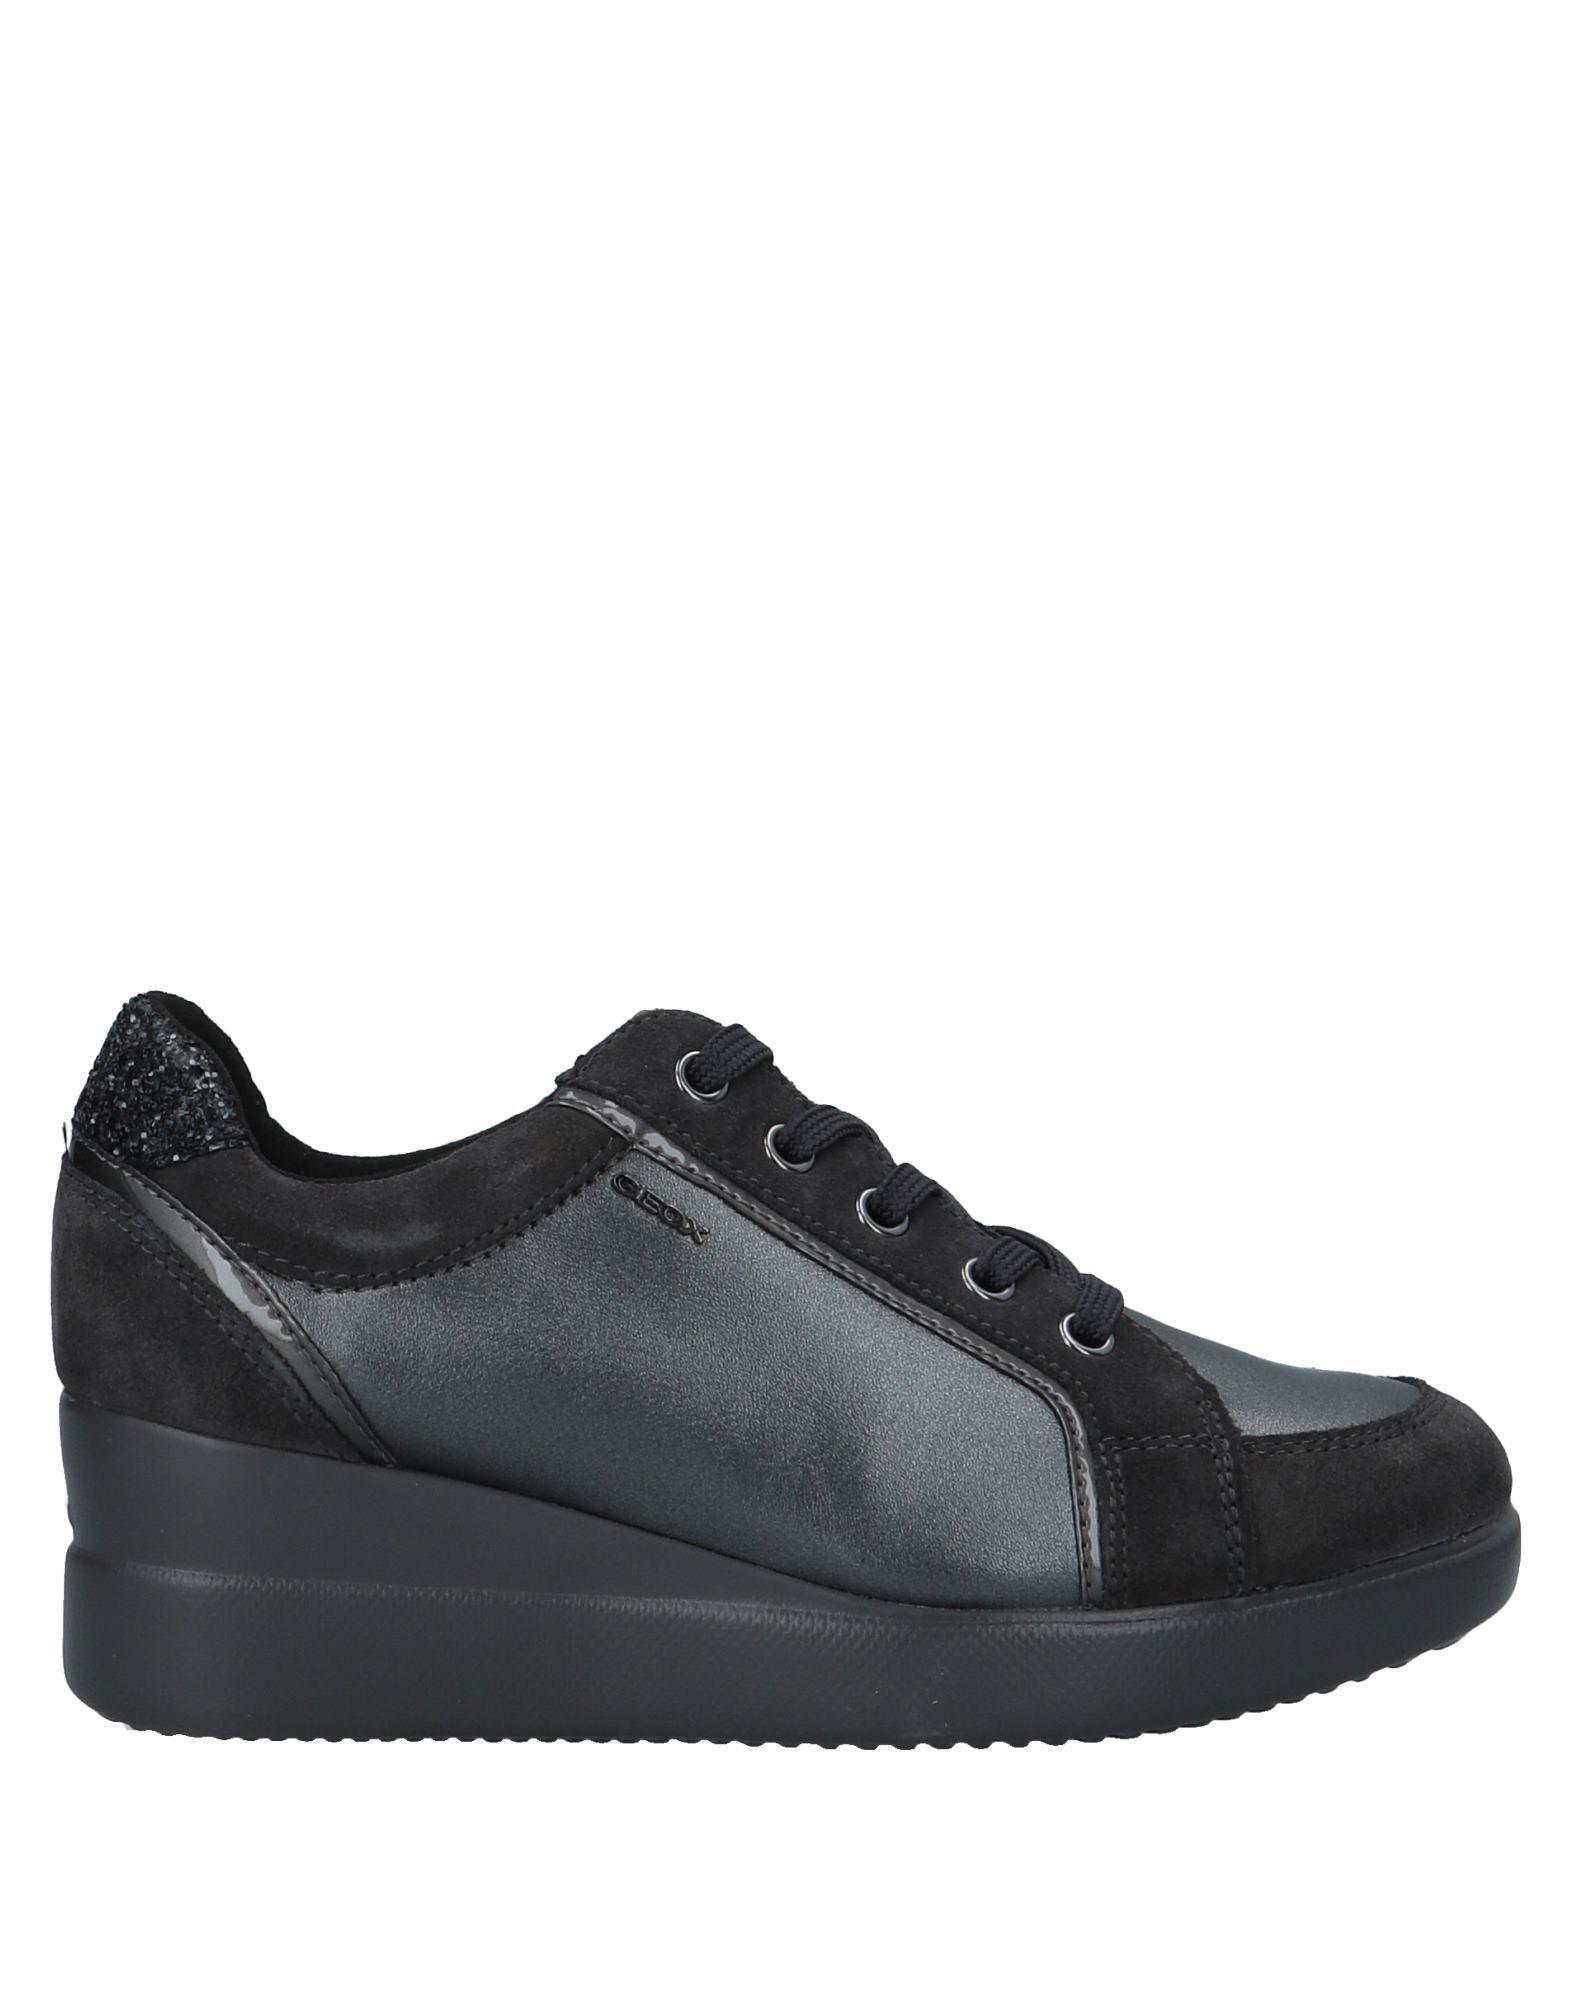 Moda Sneakers Sneakers Moda Geox Donna - 11542320MC 56f1ff